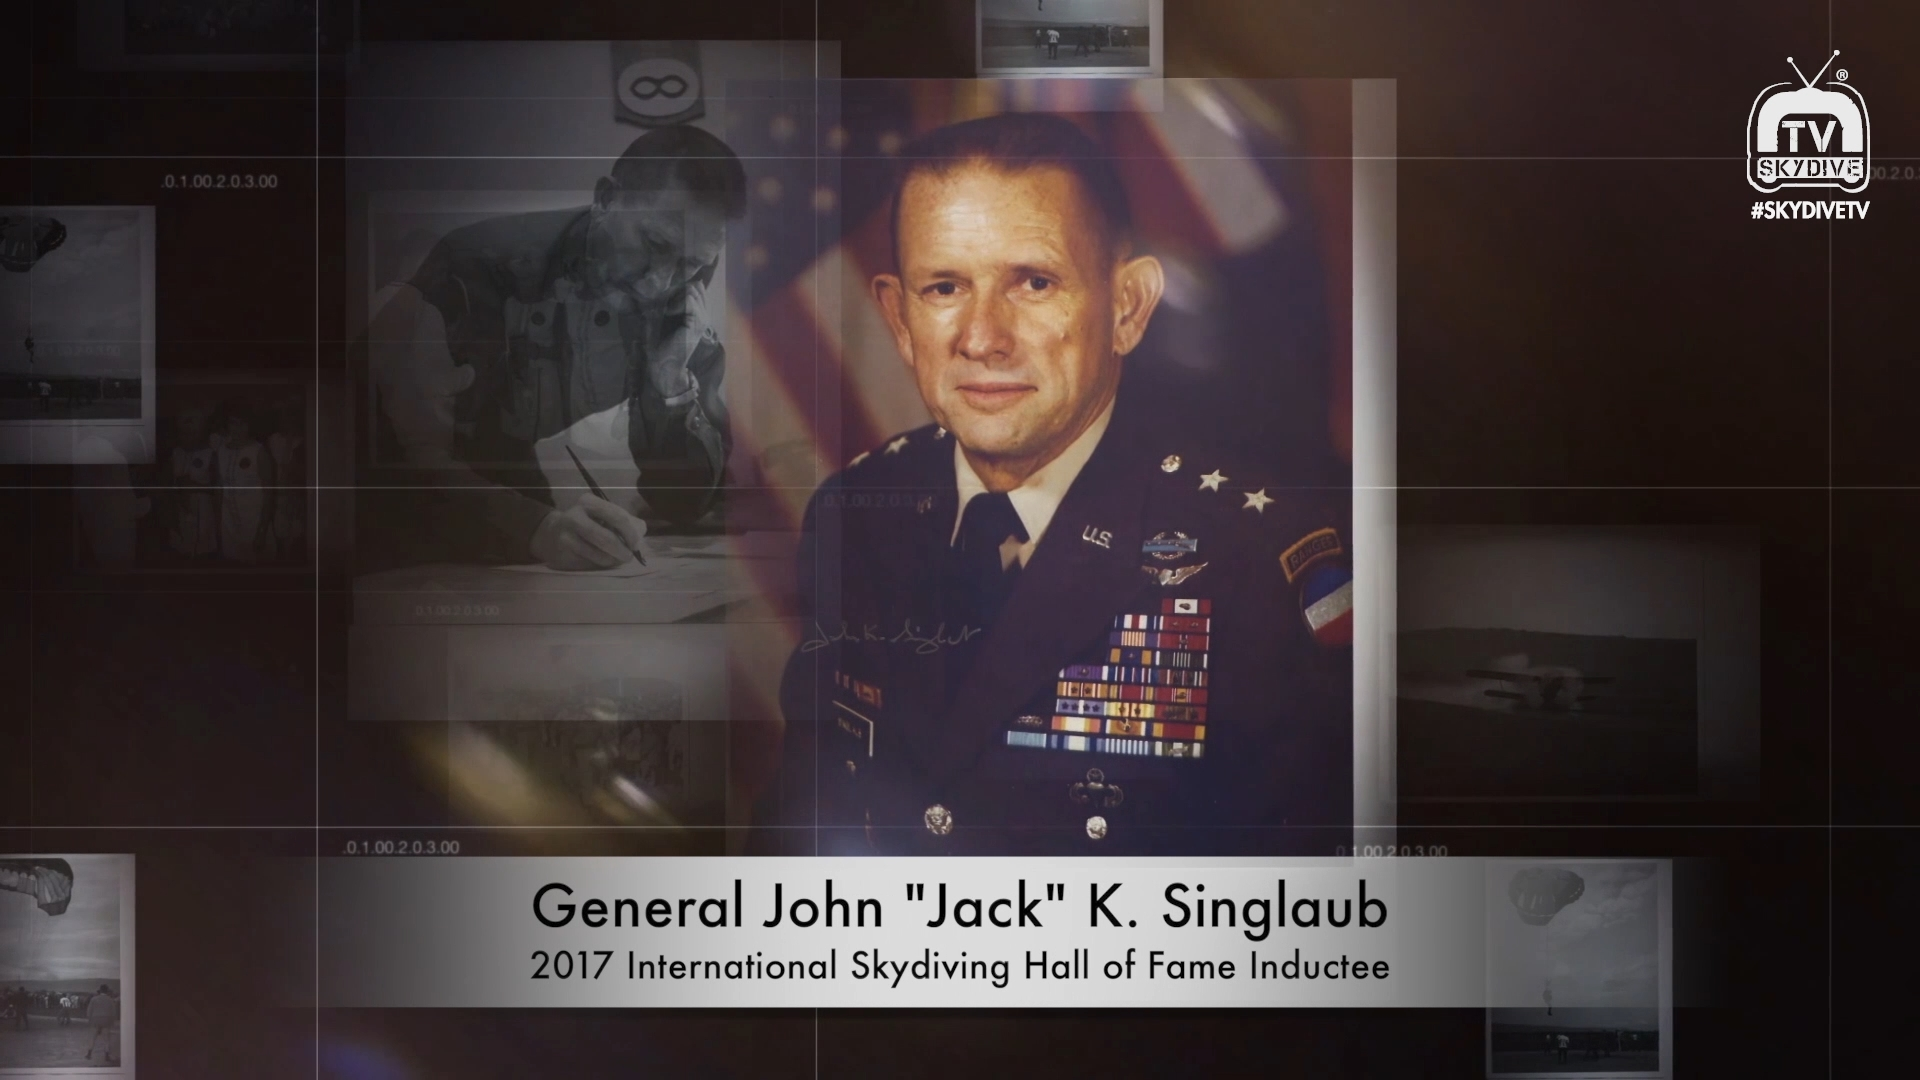 General John Jack Singlaub